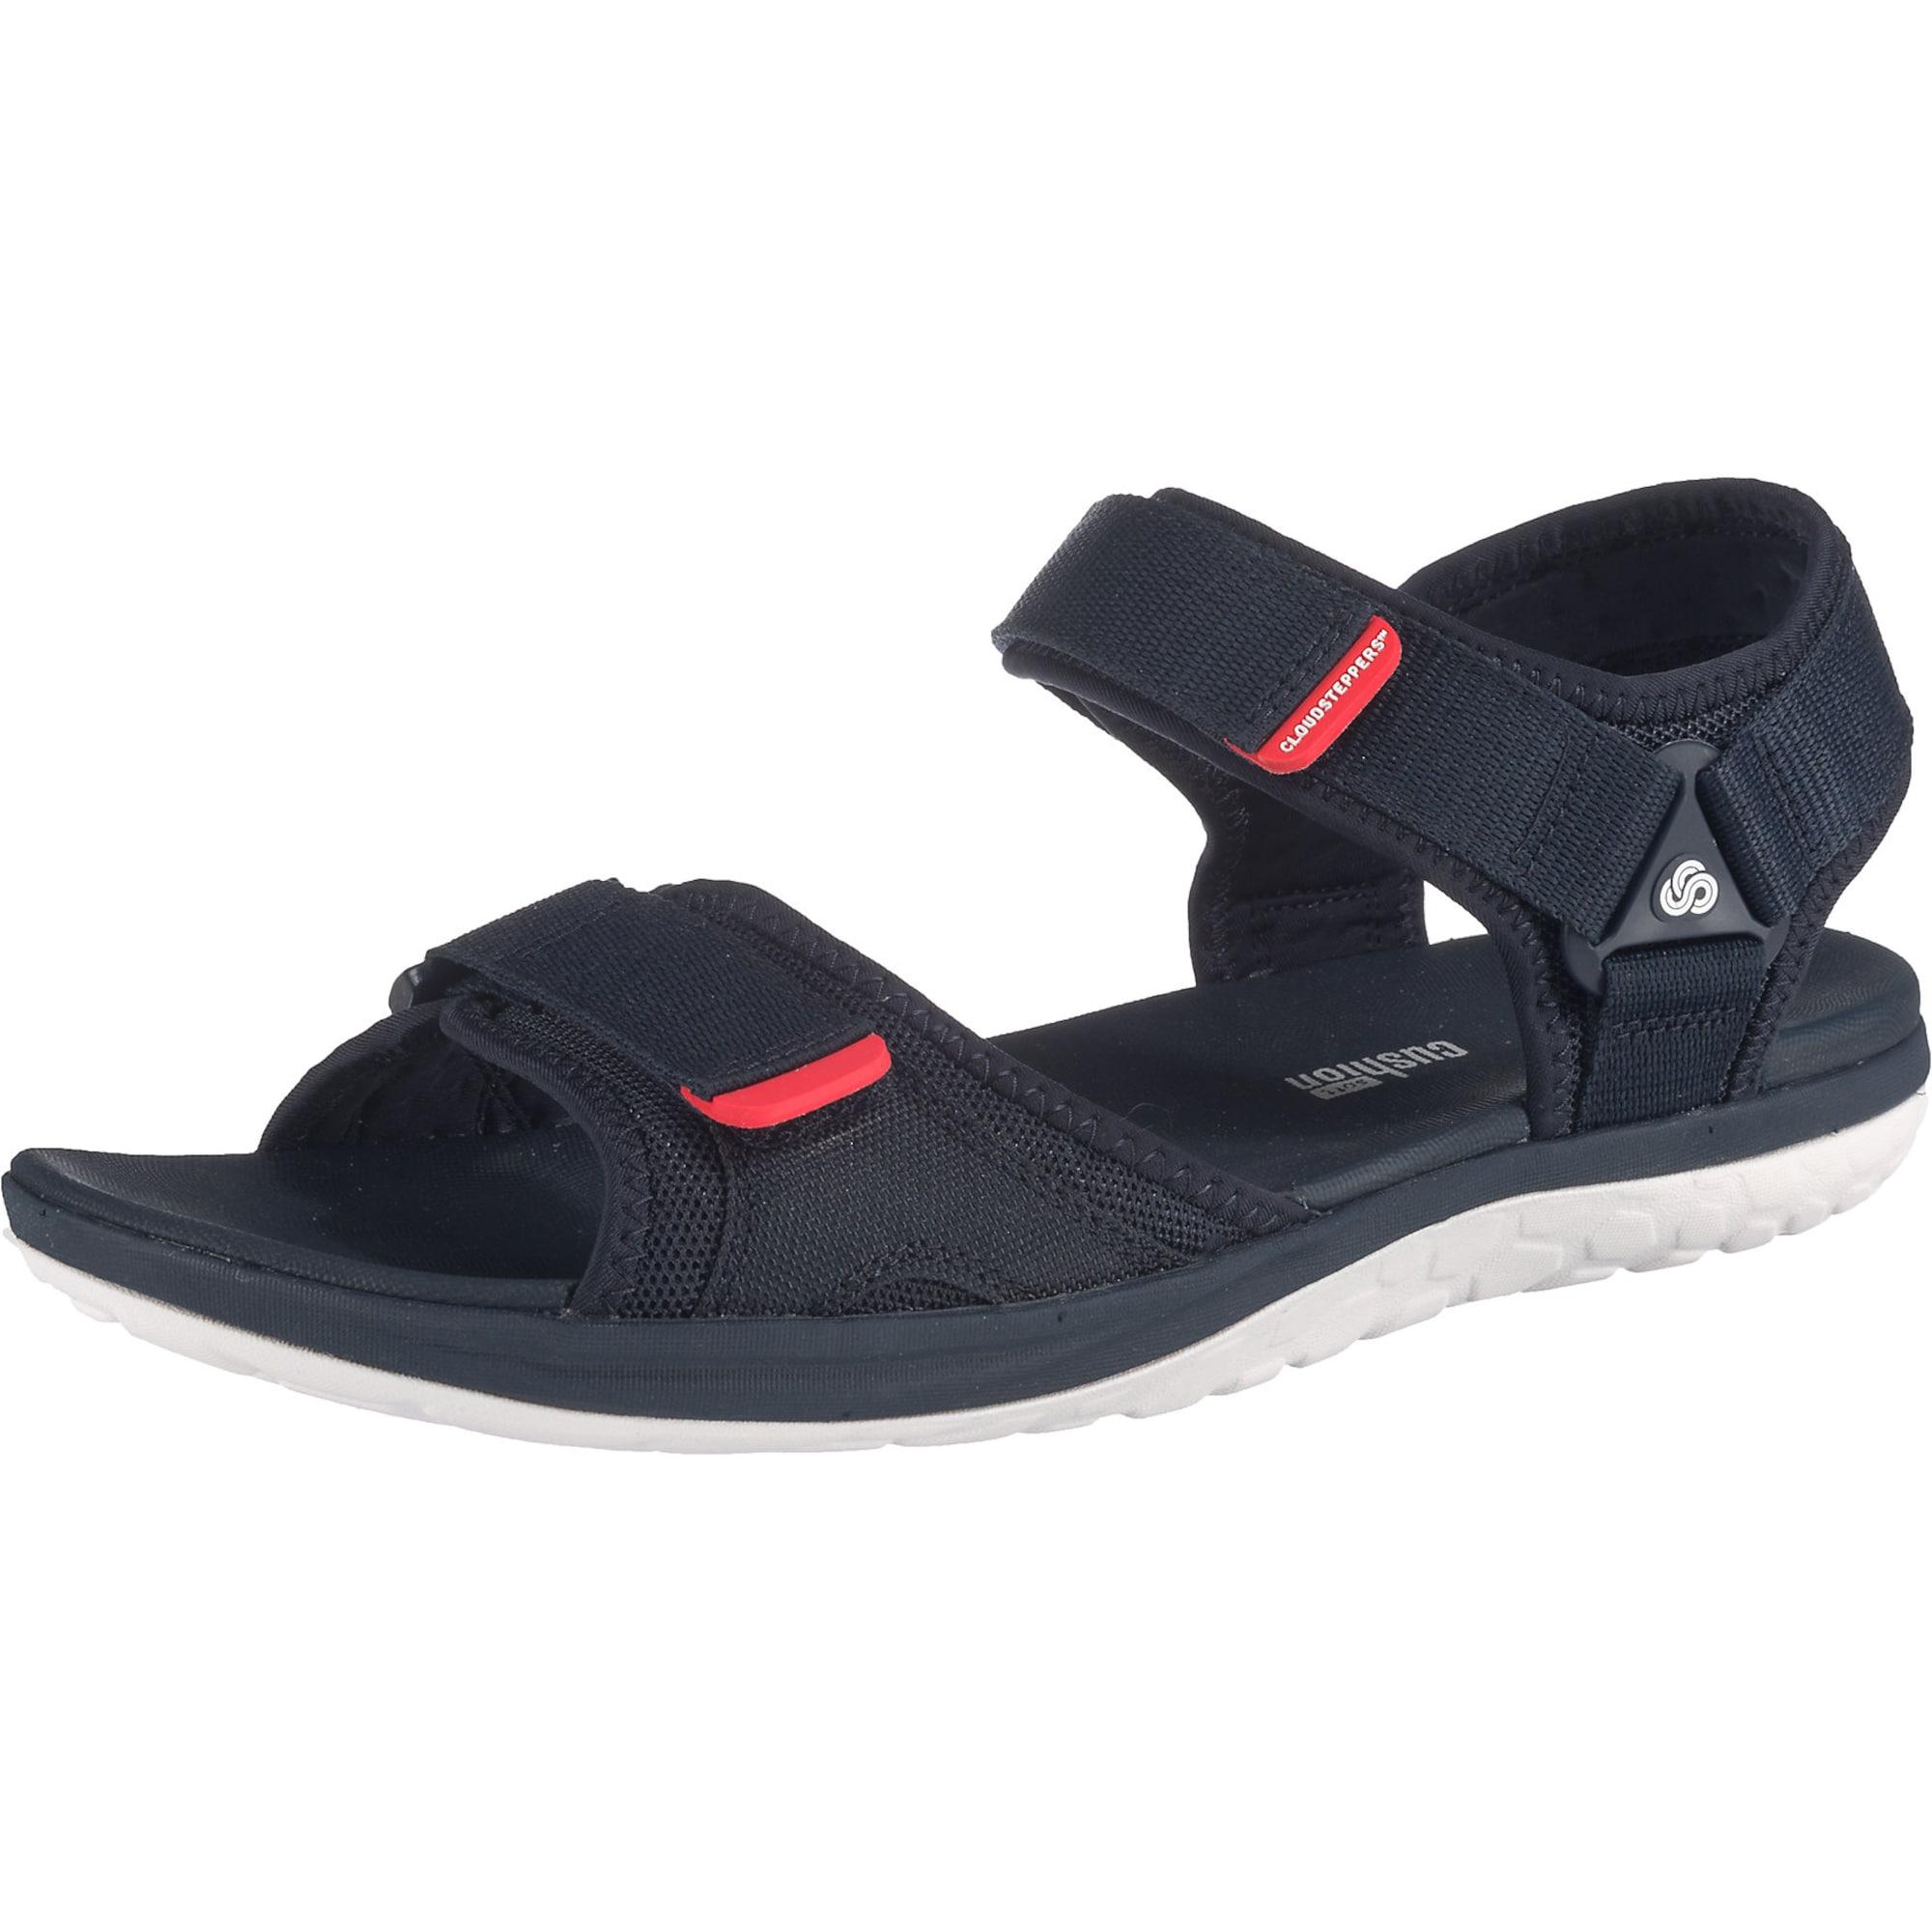 Herren - Sandalen 'Step Beat Sun' | Schuhe > Sandalen & Zehentrenner > Sandalen | Clarks